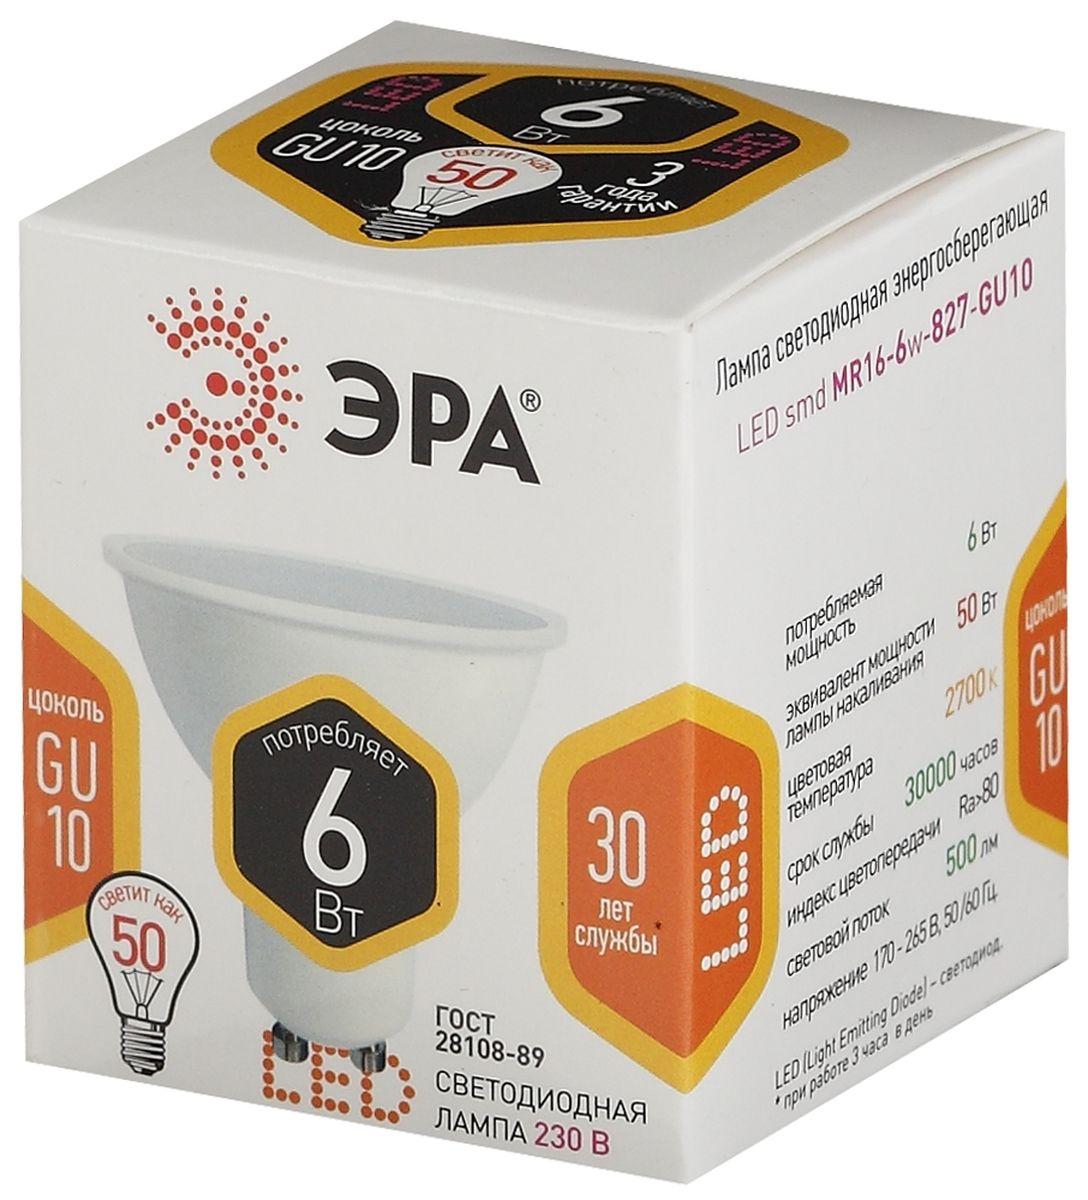 Лампа светодиодная ЭРА, LED smd MR16-6w-827-GU105055945518160